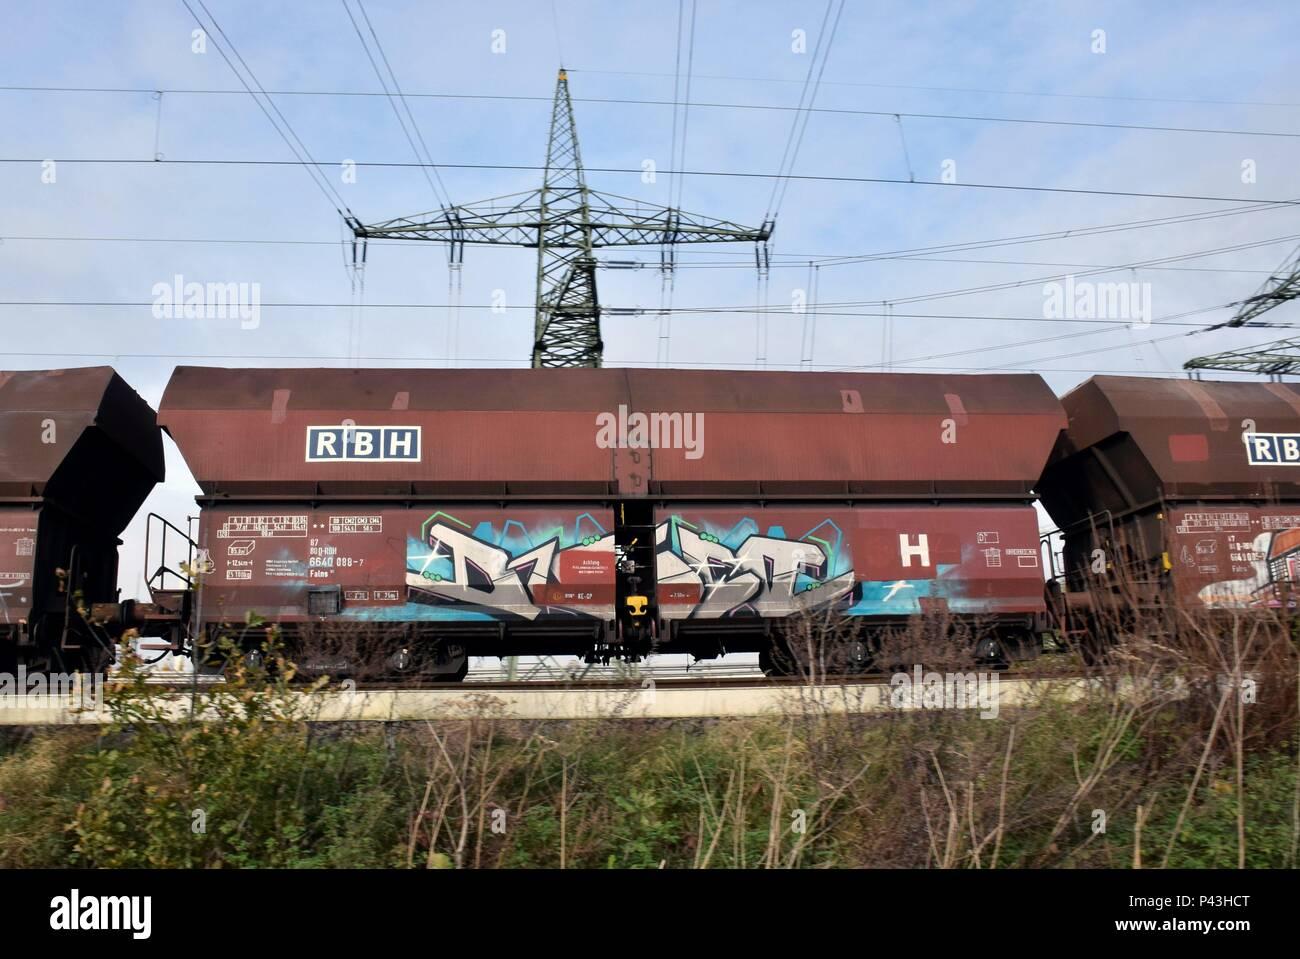 Graffiti on freight train on 14.11.2017 in Datteln - Germany. | usage worldwide - Stock Image